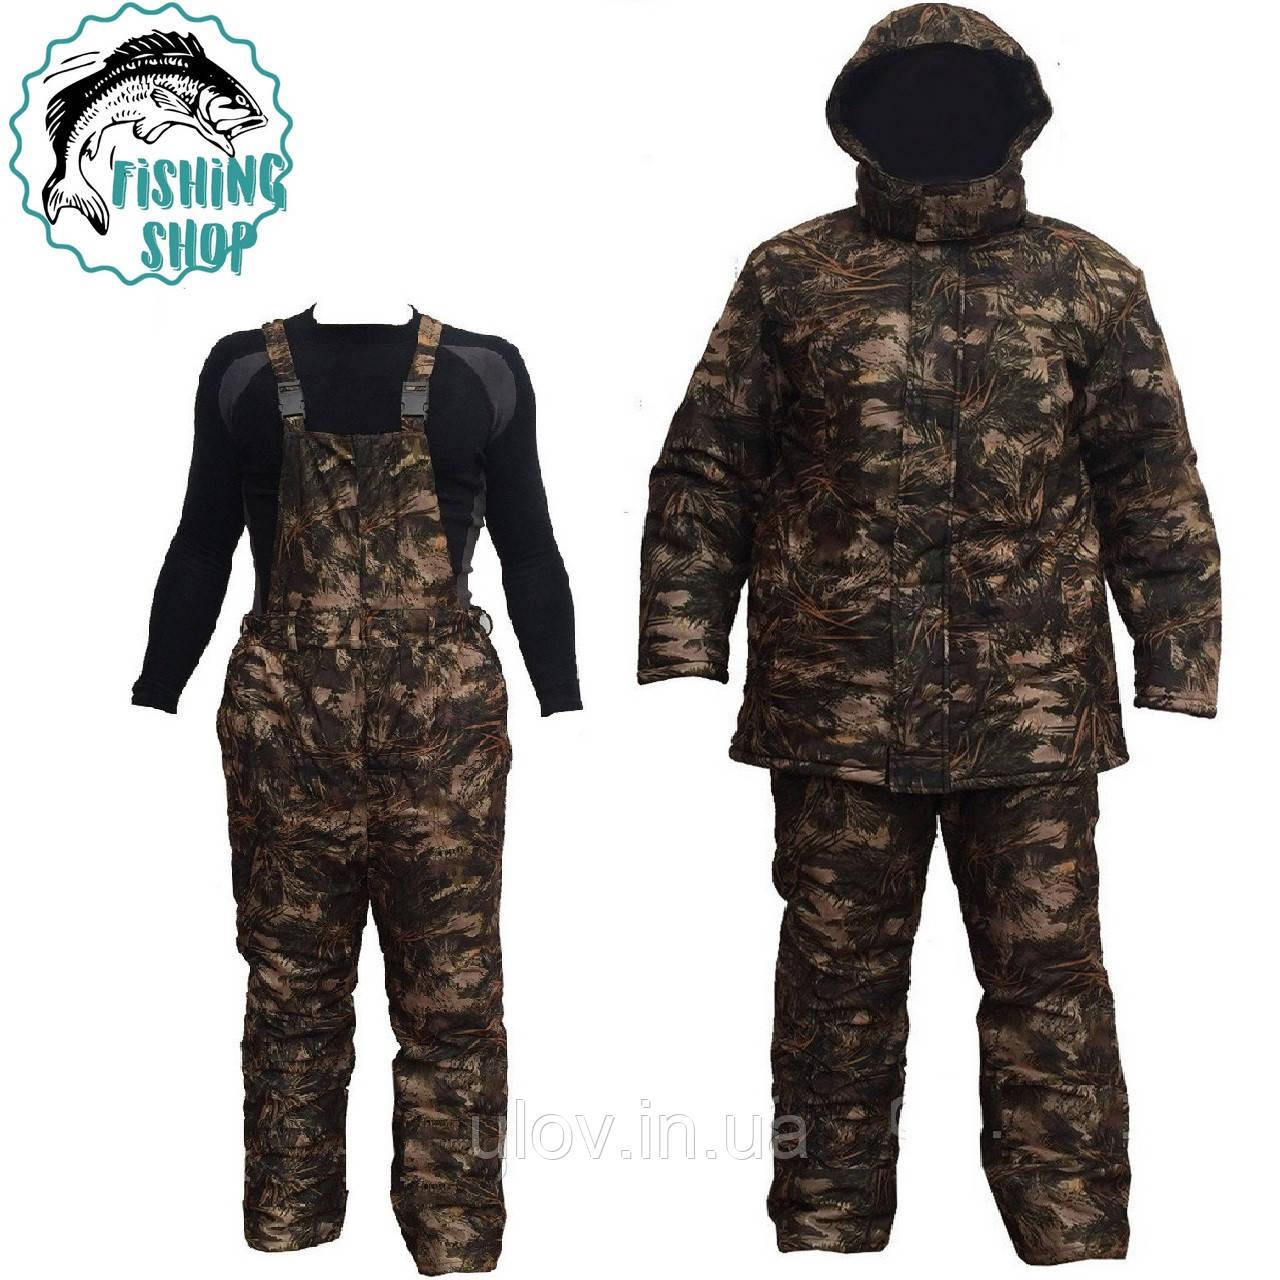 "Зимний костюм из непромокаемой ткани ALOVA ""ОХОТНИК"""